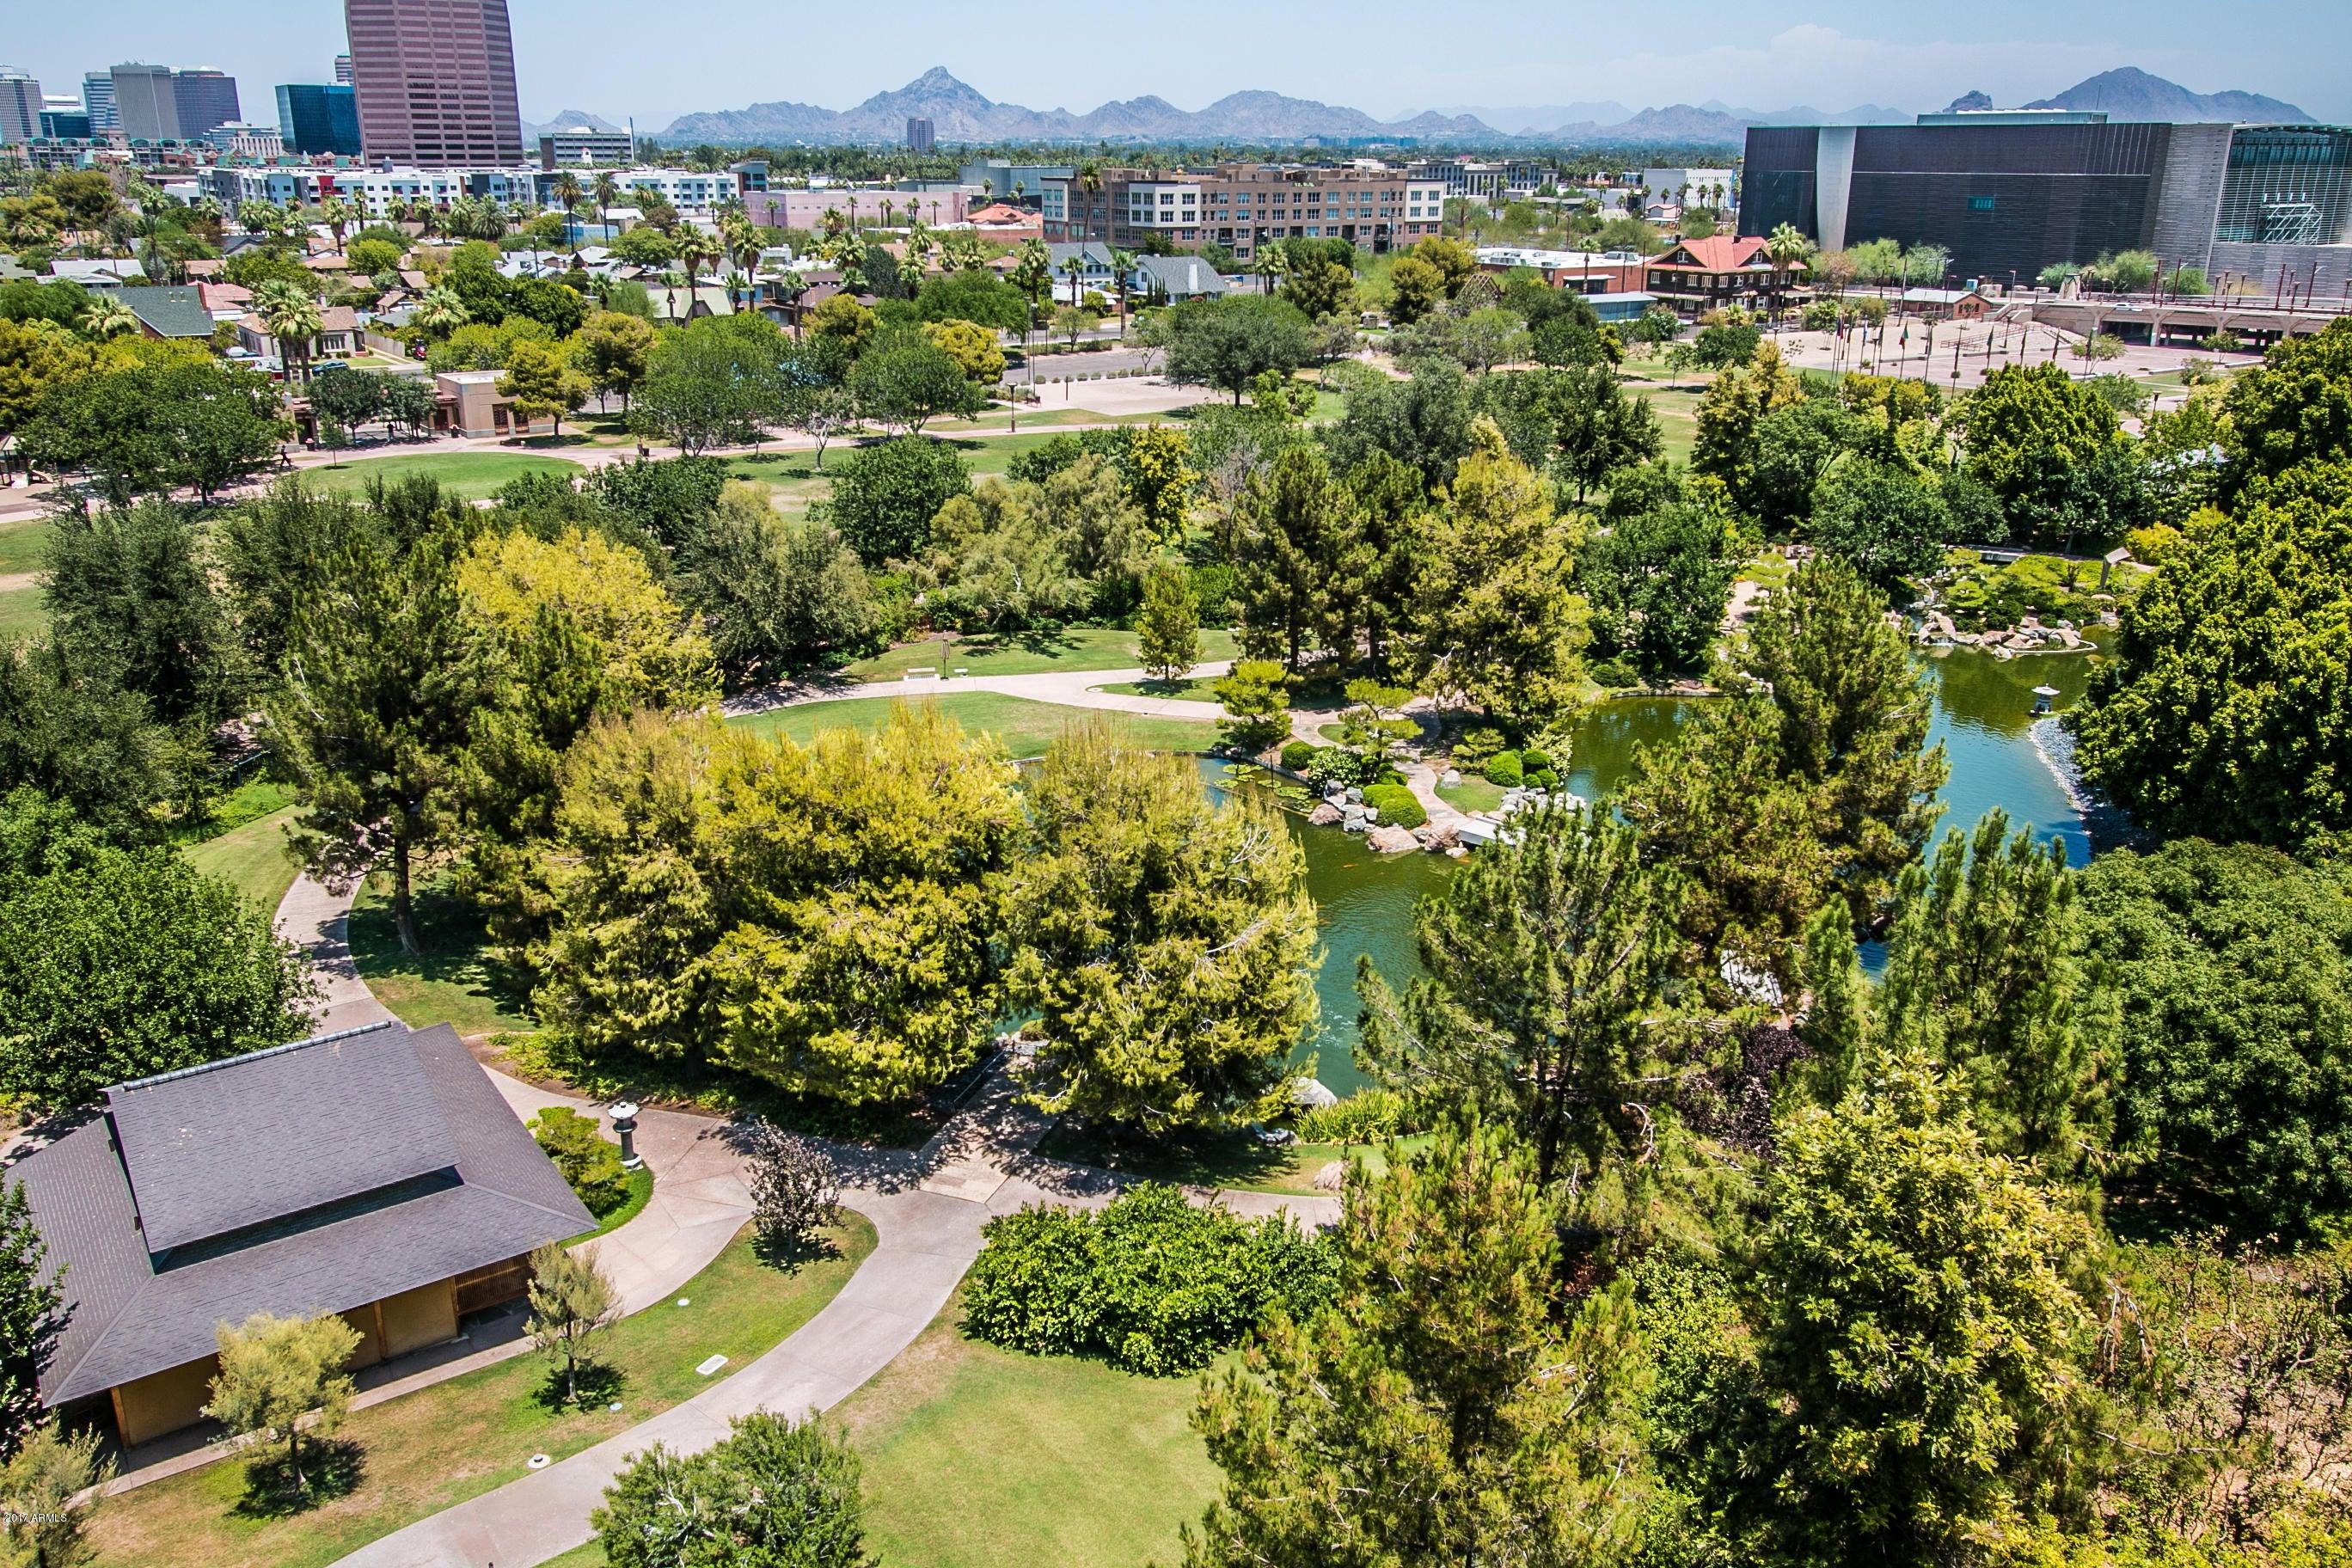 208 W PORTLAND Street Unit 556 Phoenix, AZ 85003 - MLS #: 5626943